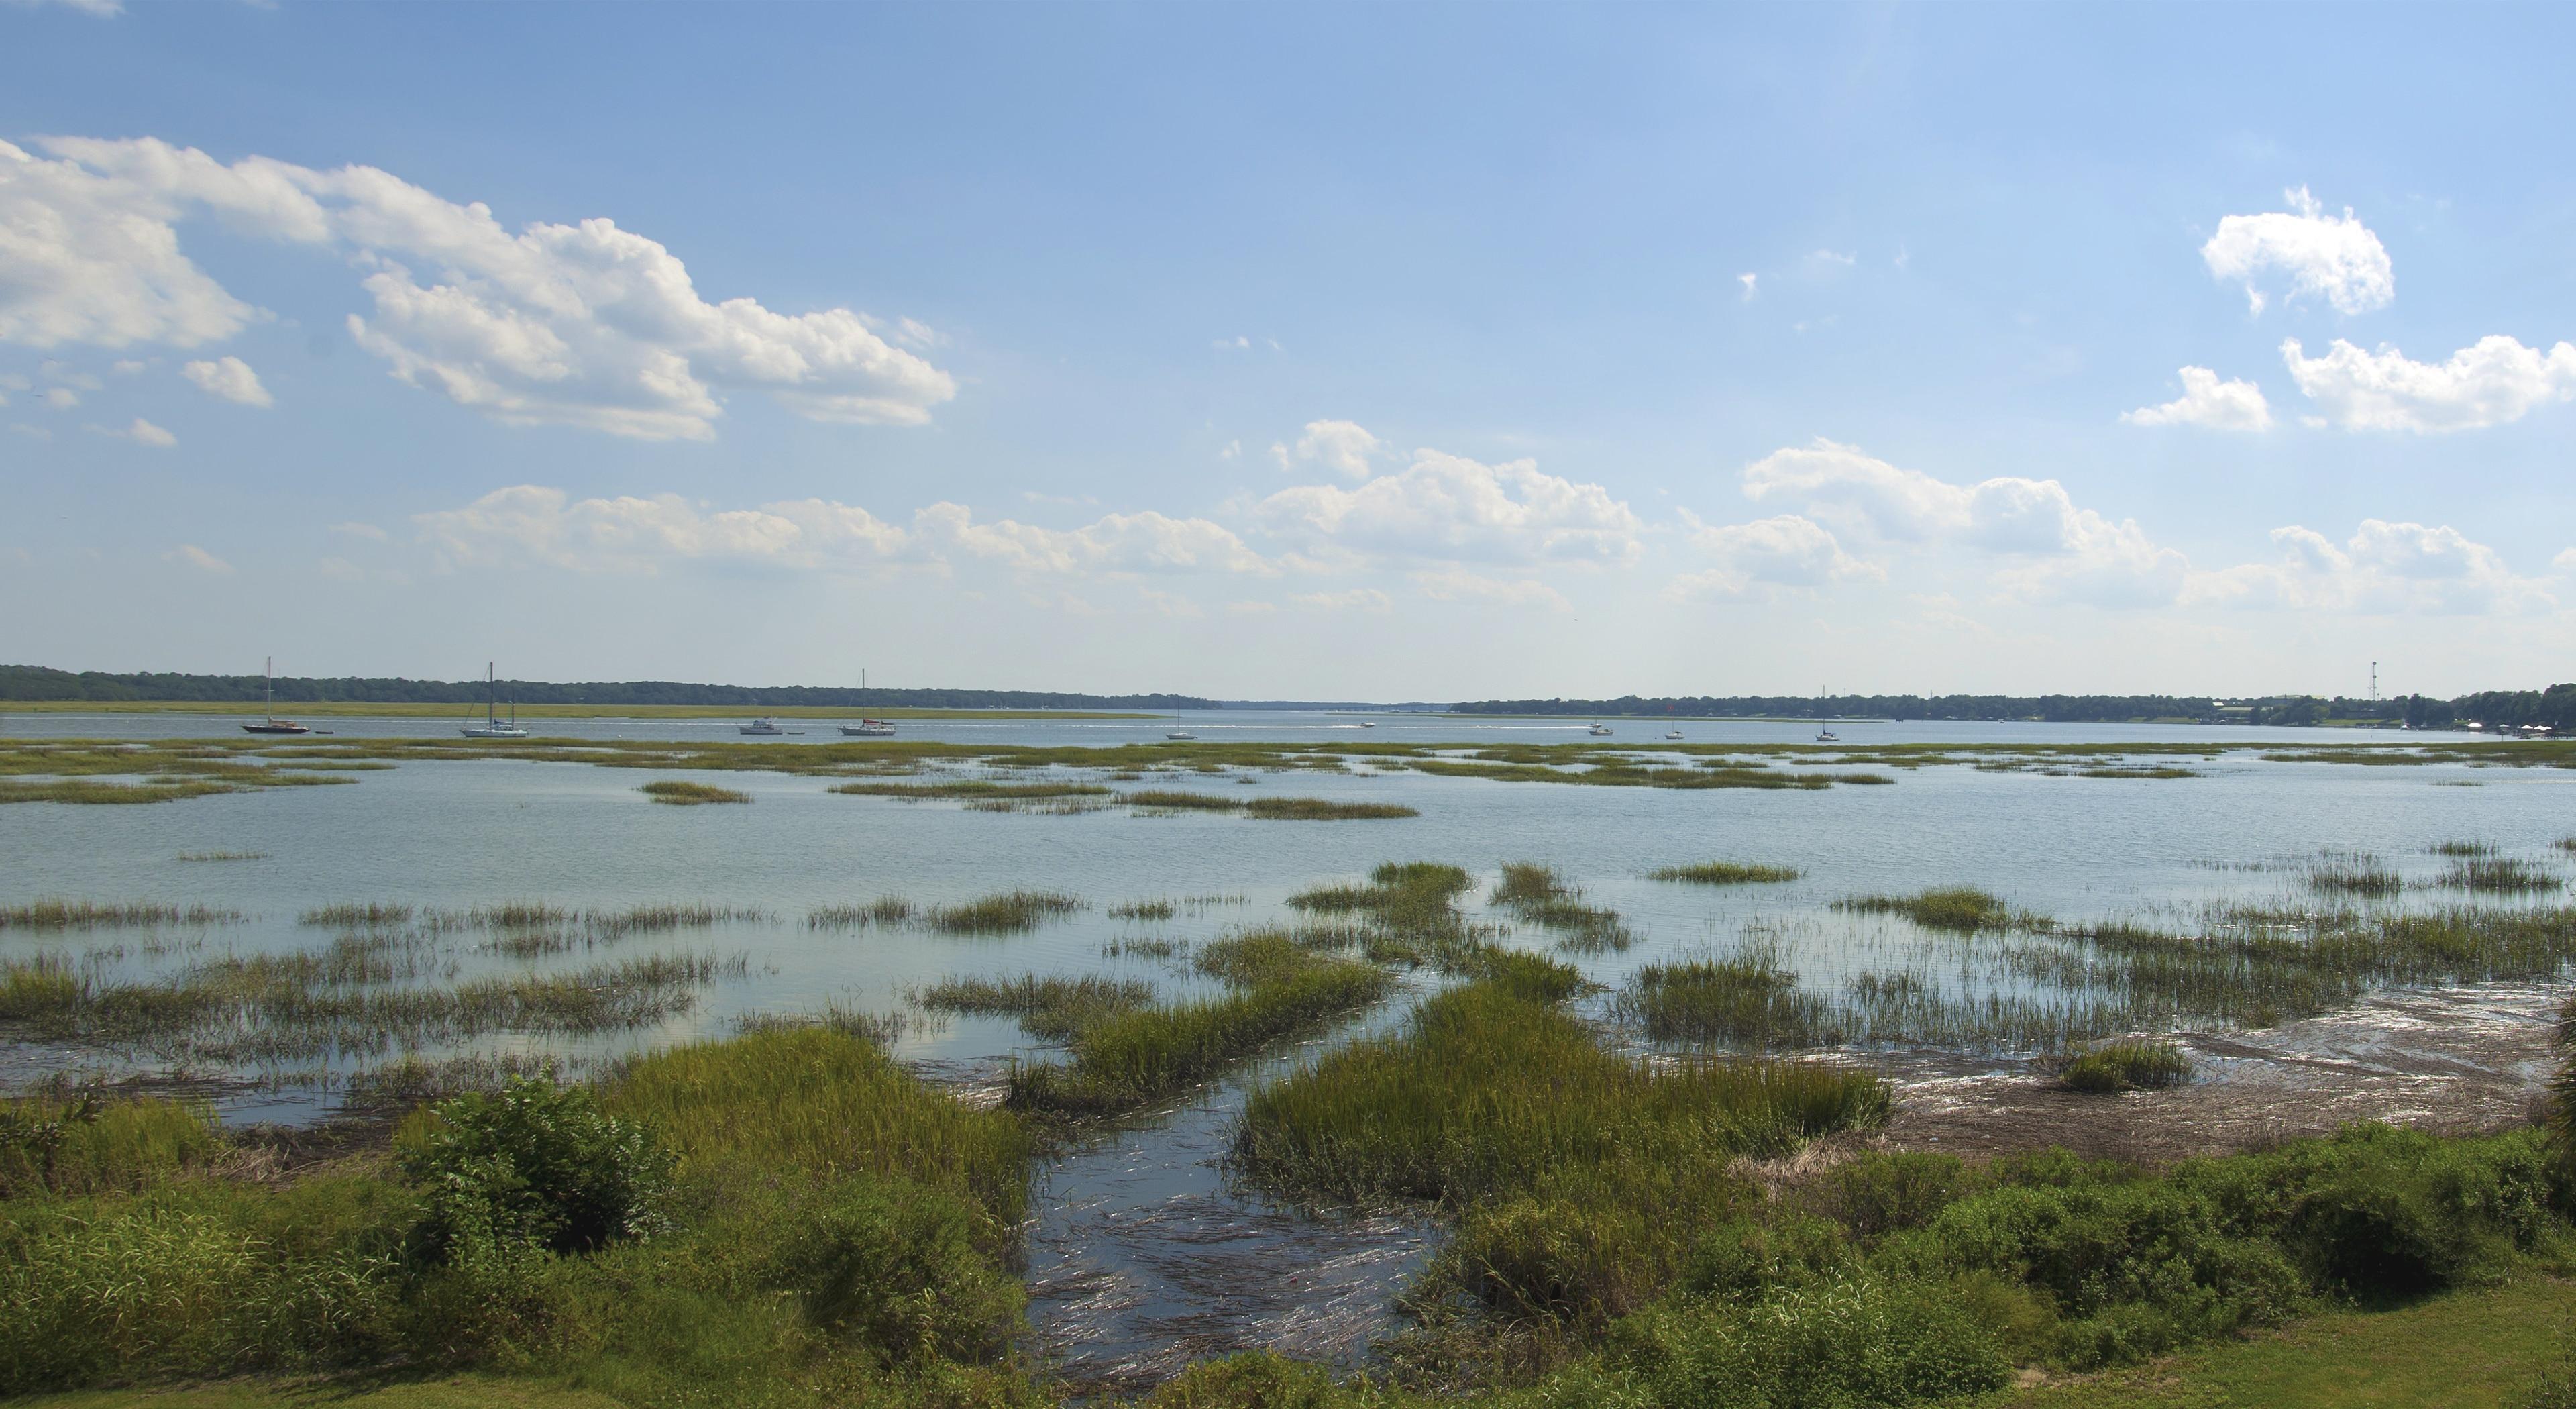 Beaufort, South Carolina, United States of America